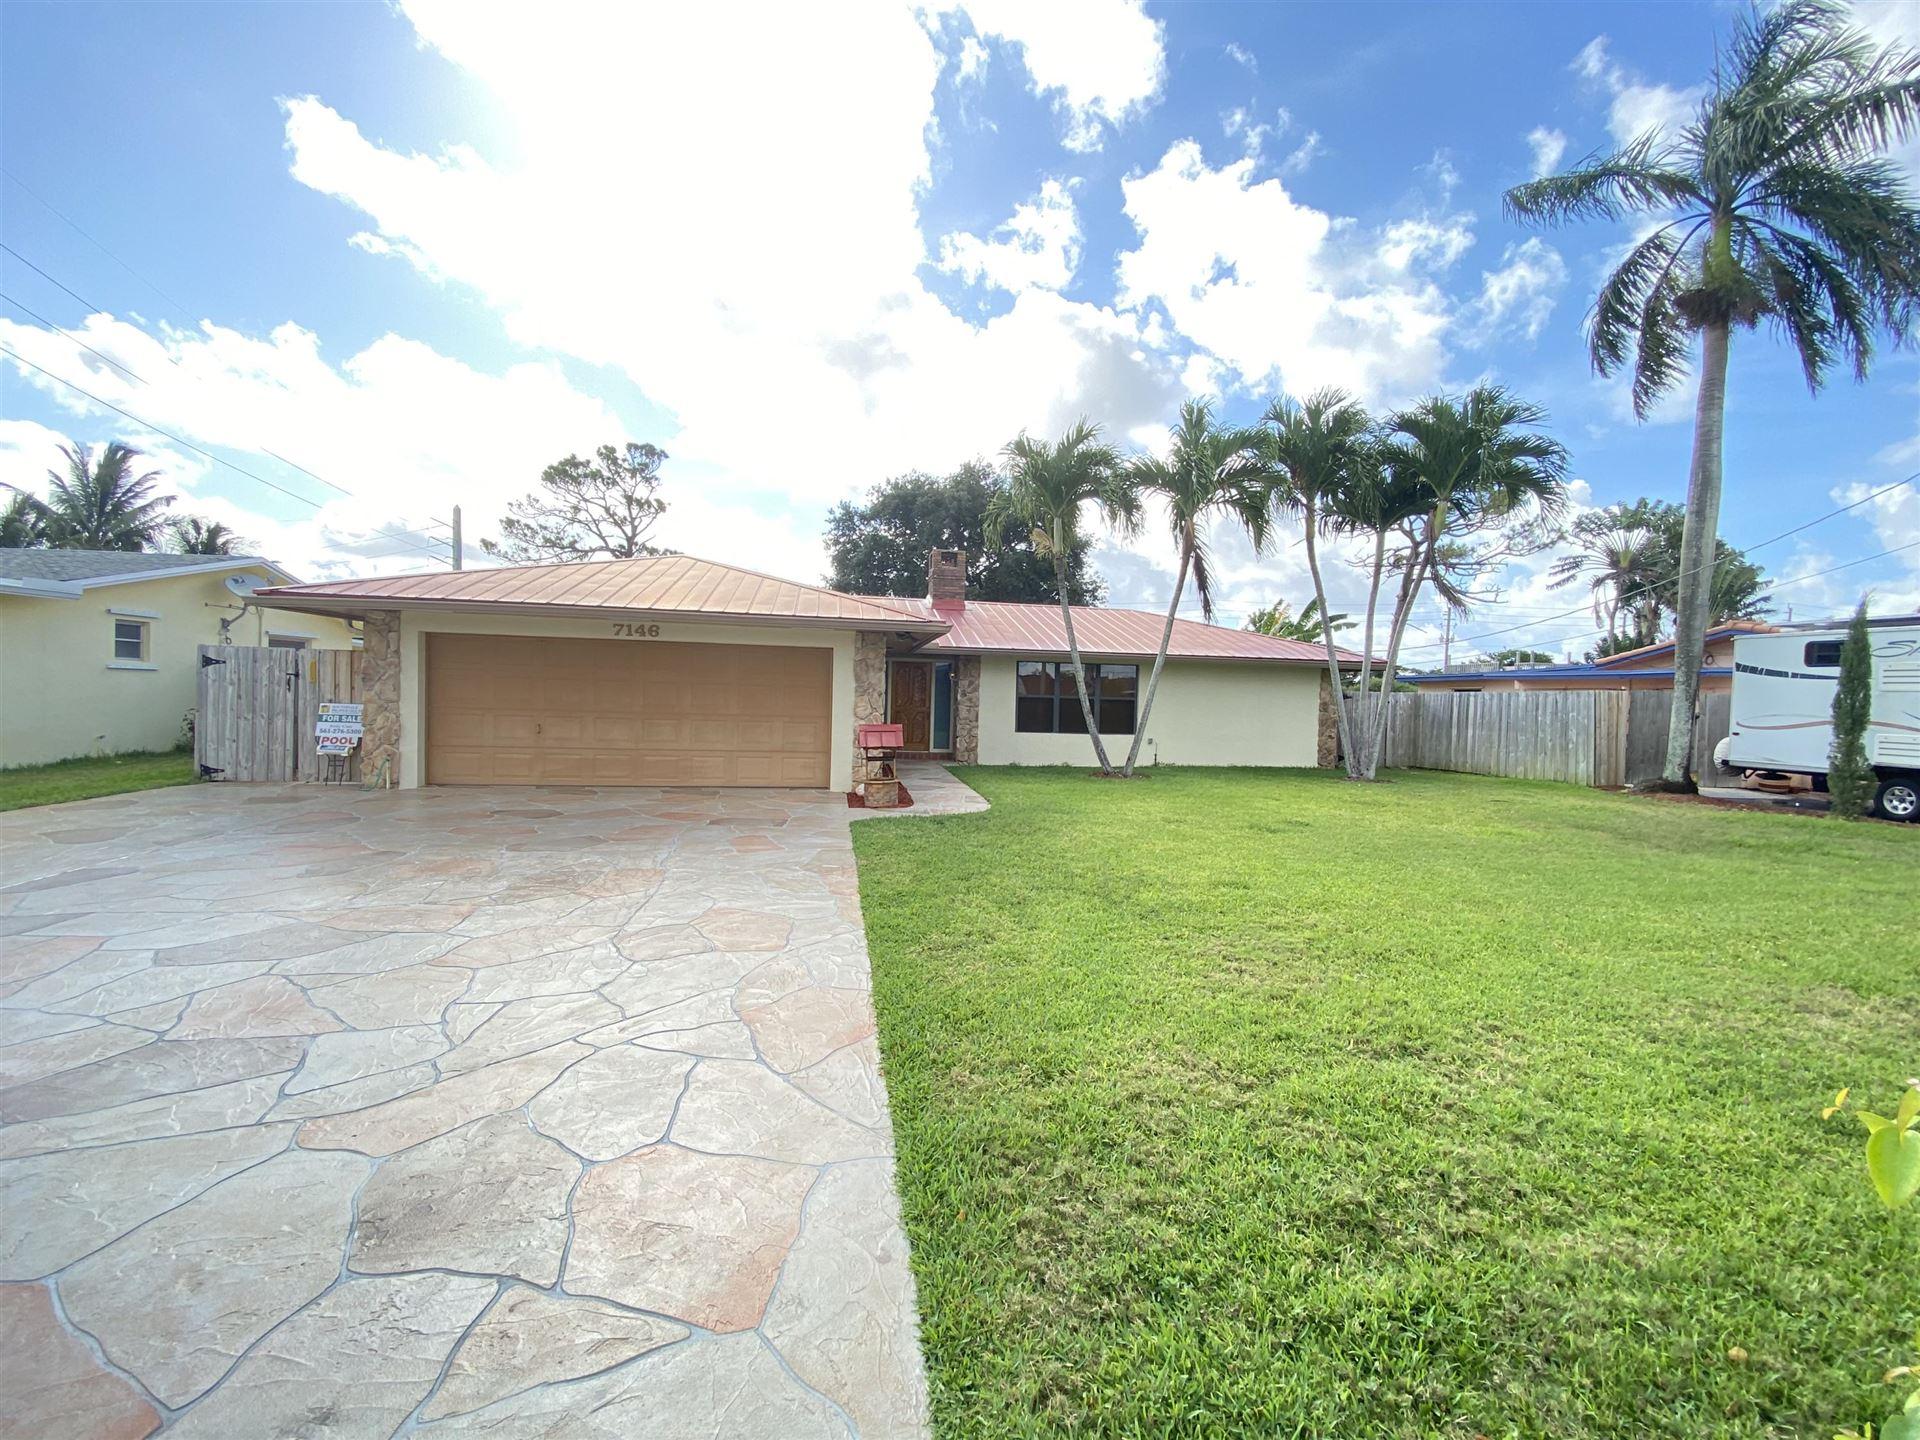 7146 Thompson Road, Boynton Beach, FL 33426 - MLS#: RX-10714846